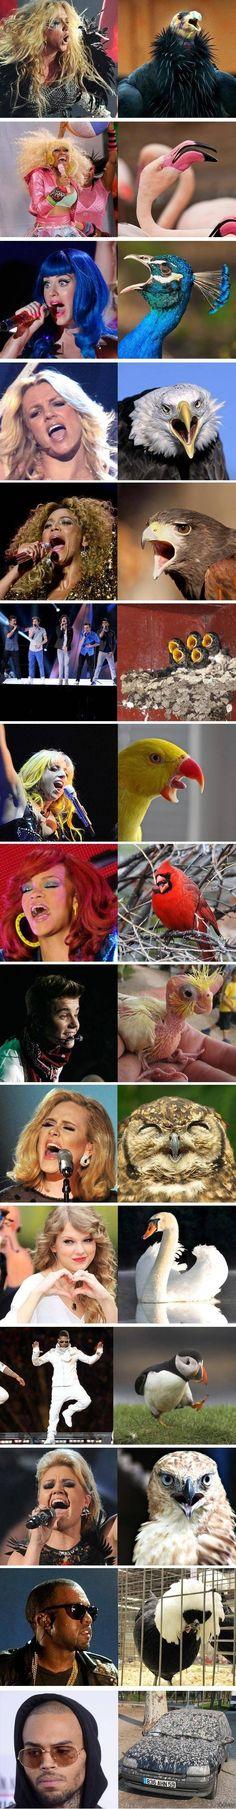 If famous singers were birds. - Imgur